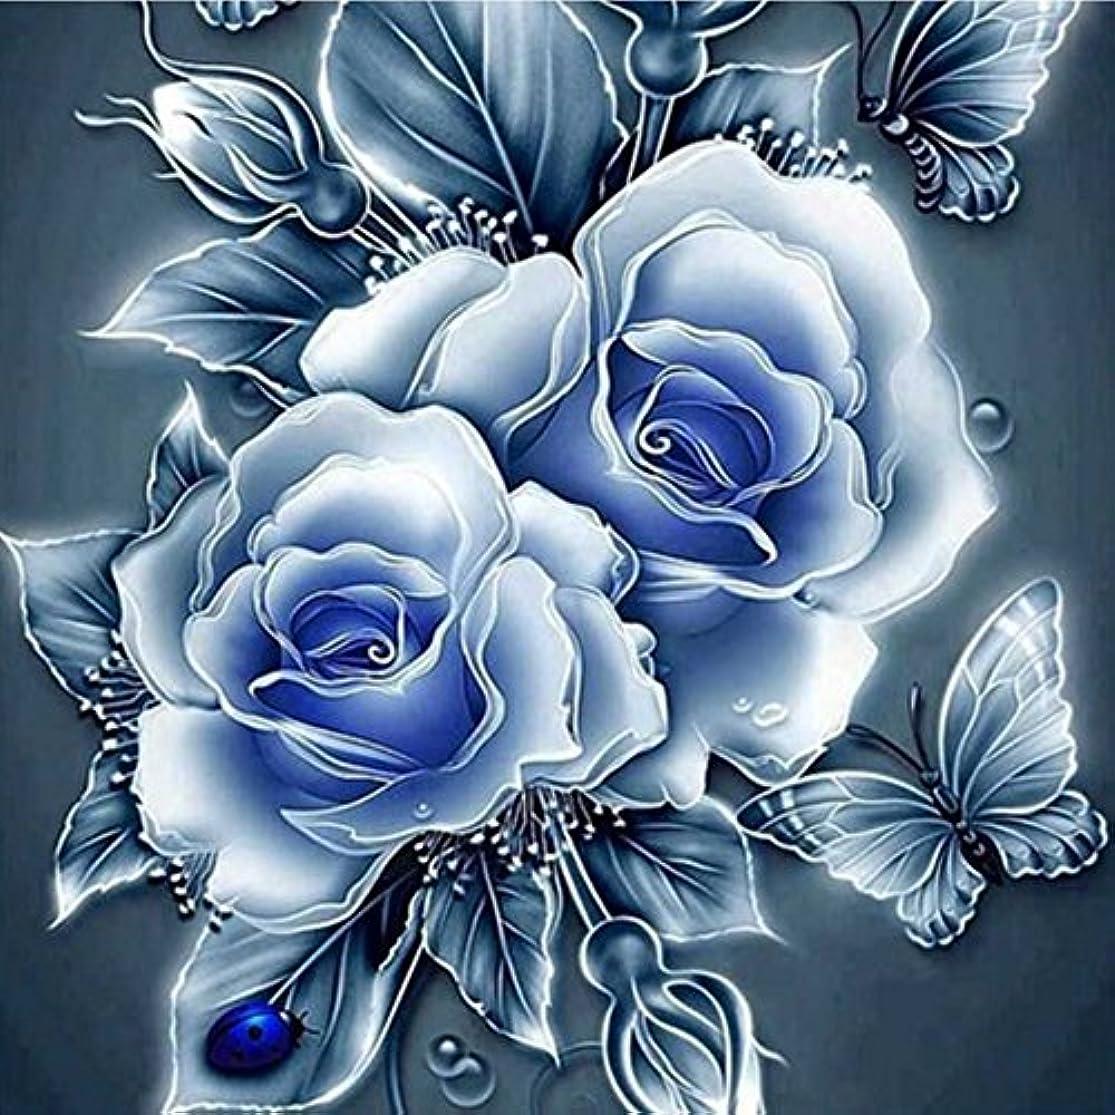 Wowdecor 5D Crystal Diamond Painting with Diamonds Kits, Retro Blue Rose & Butterfly, Full Drill DIY Diamond Dotz Embroidery Crafts Graphy Art tggjlnur2